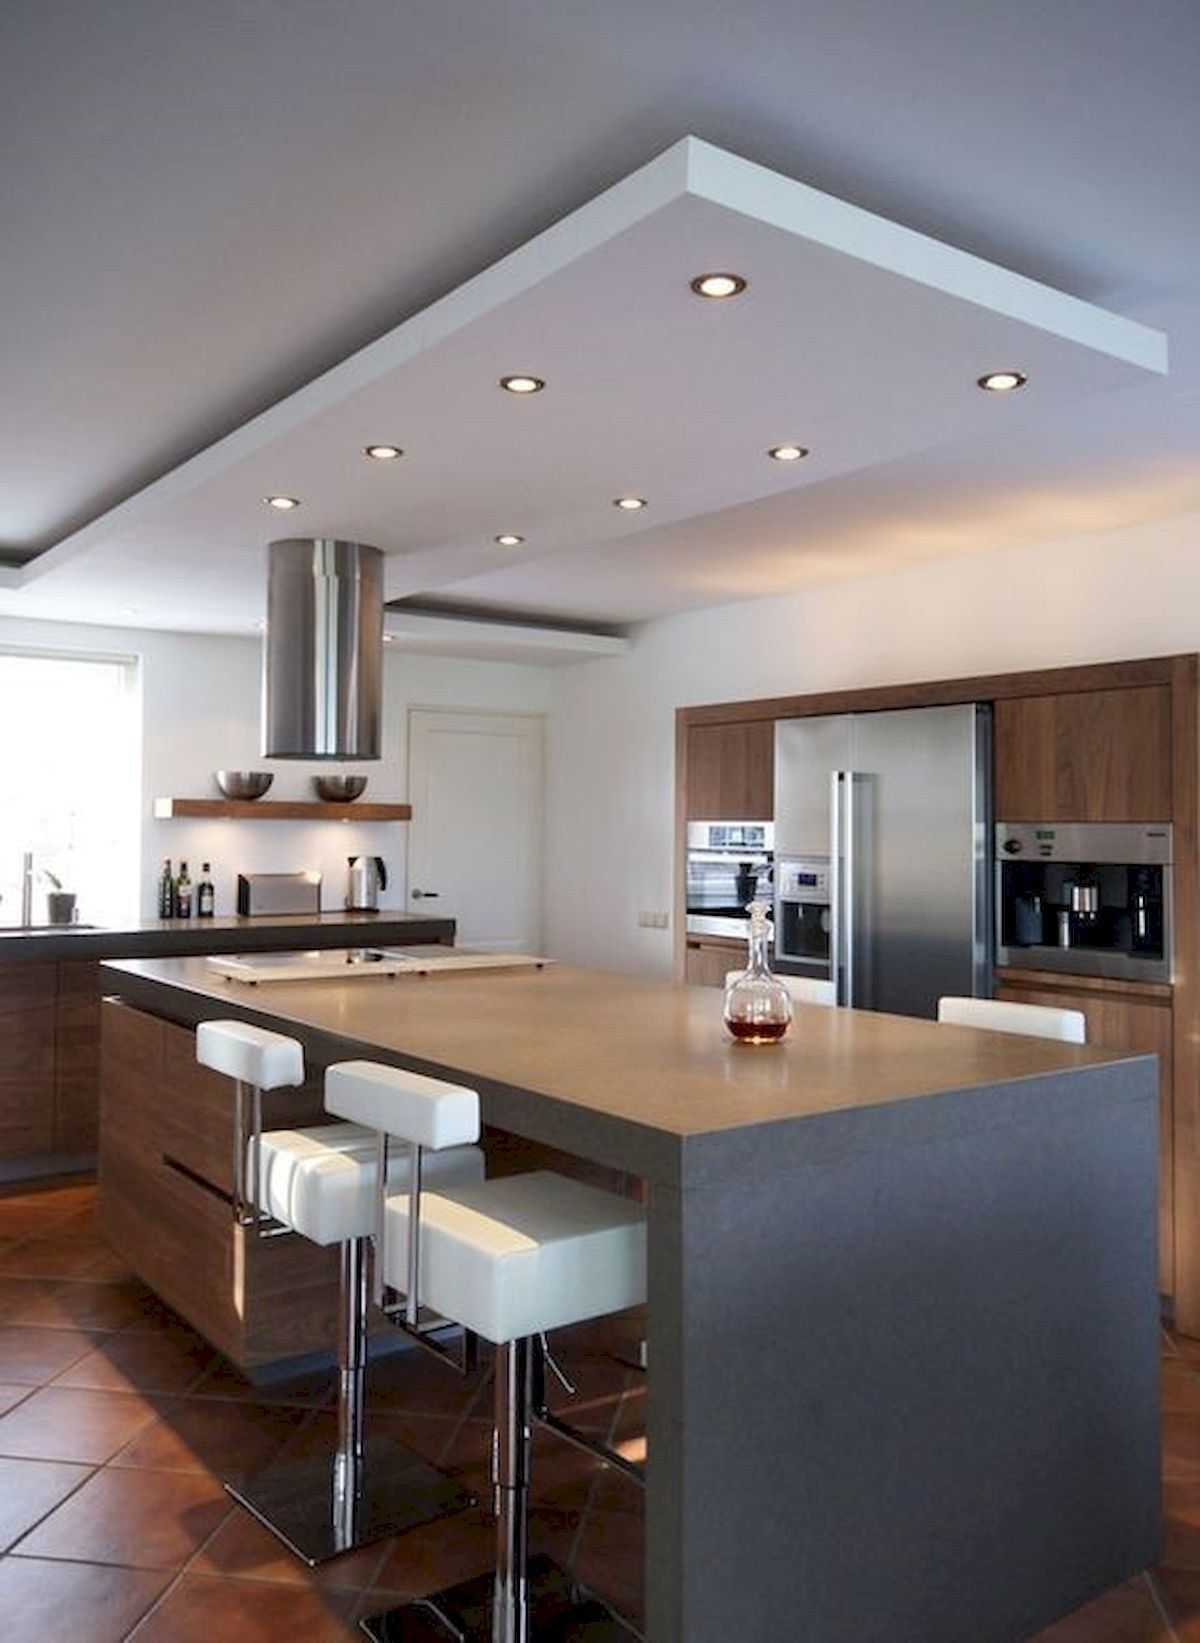 26 Awesome Popular Modern Kitchen Cabinets Design Ideas Kitchen Ceiling Design Modern Kitchen Cabinet Design Dream Kitchens Design